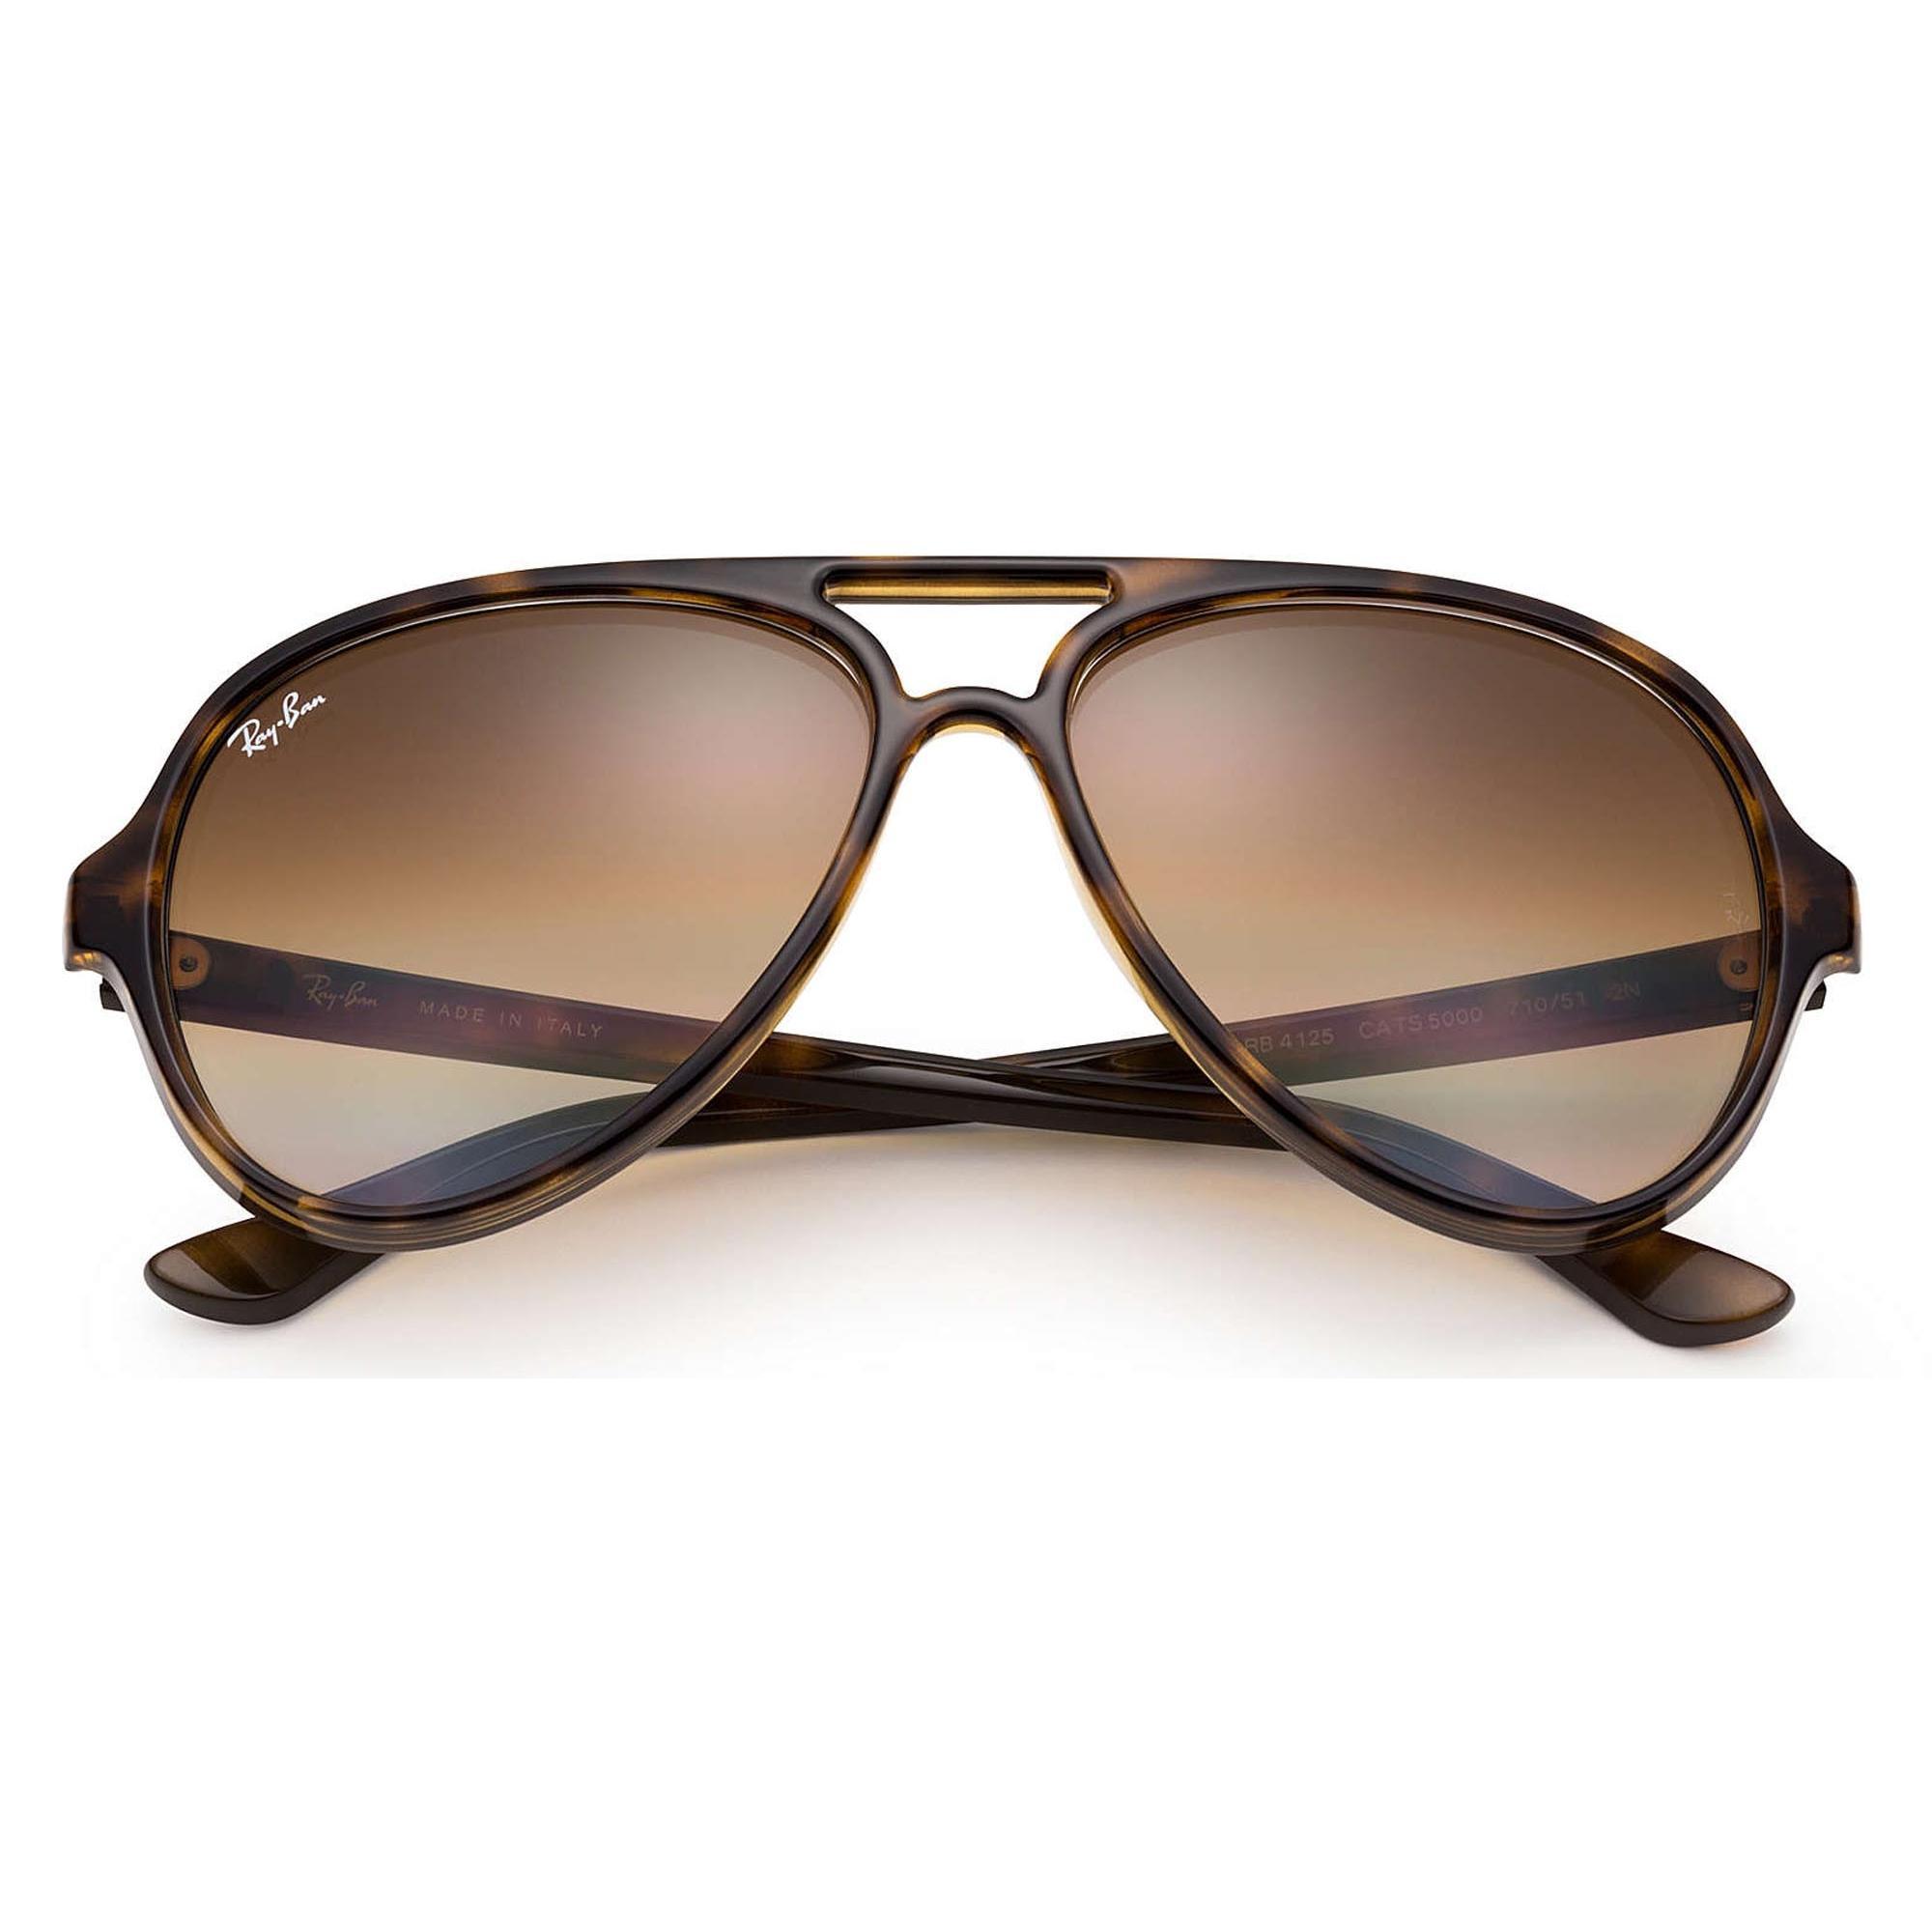 3c83f1c56f2 Ray-Ban - Gray Tortoise Cats 5000 Classic Sunglasses - Light Brown Gradient  Lenses for. View fullscreen